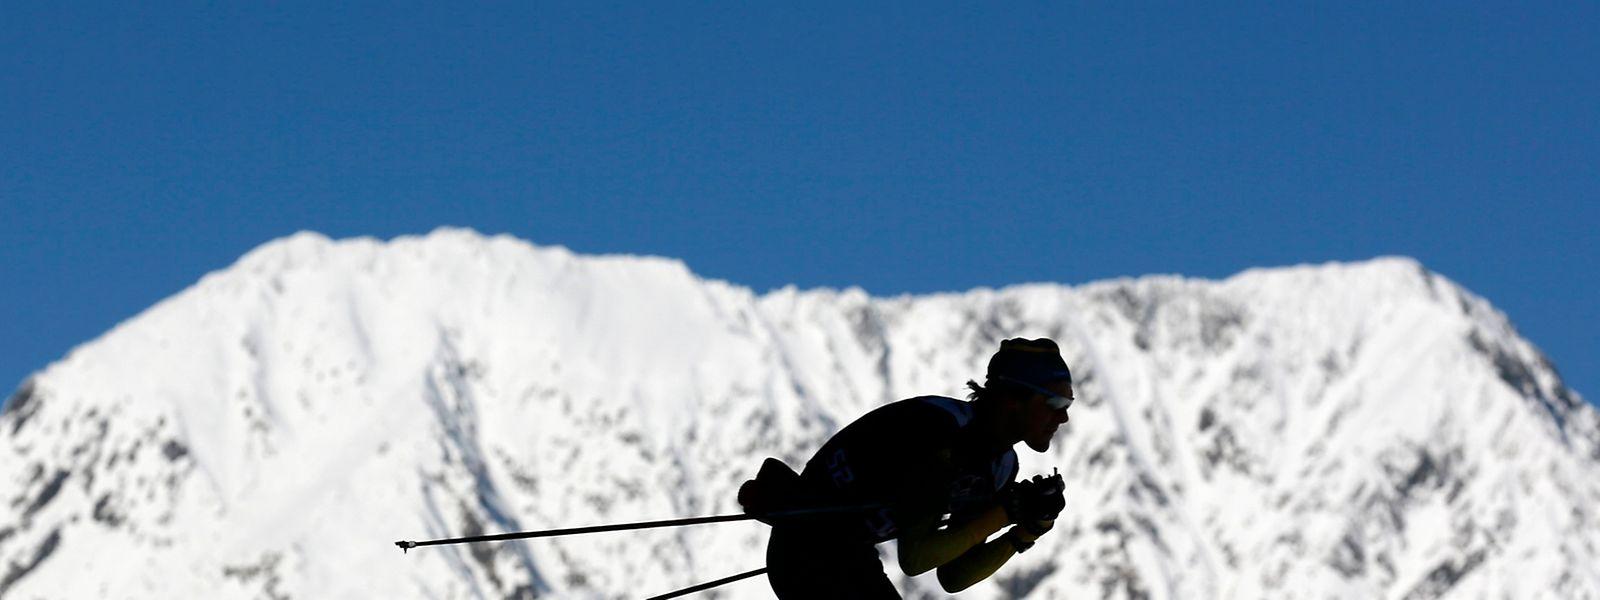 Klagewelle droht: Wirbel um Doping-Geständnis in Russland